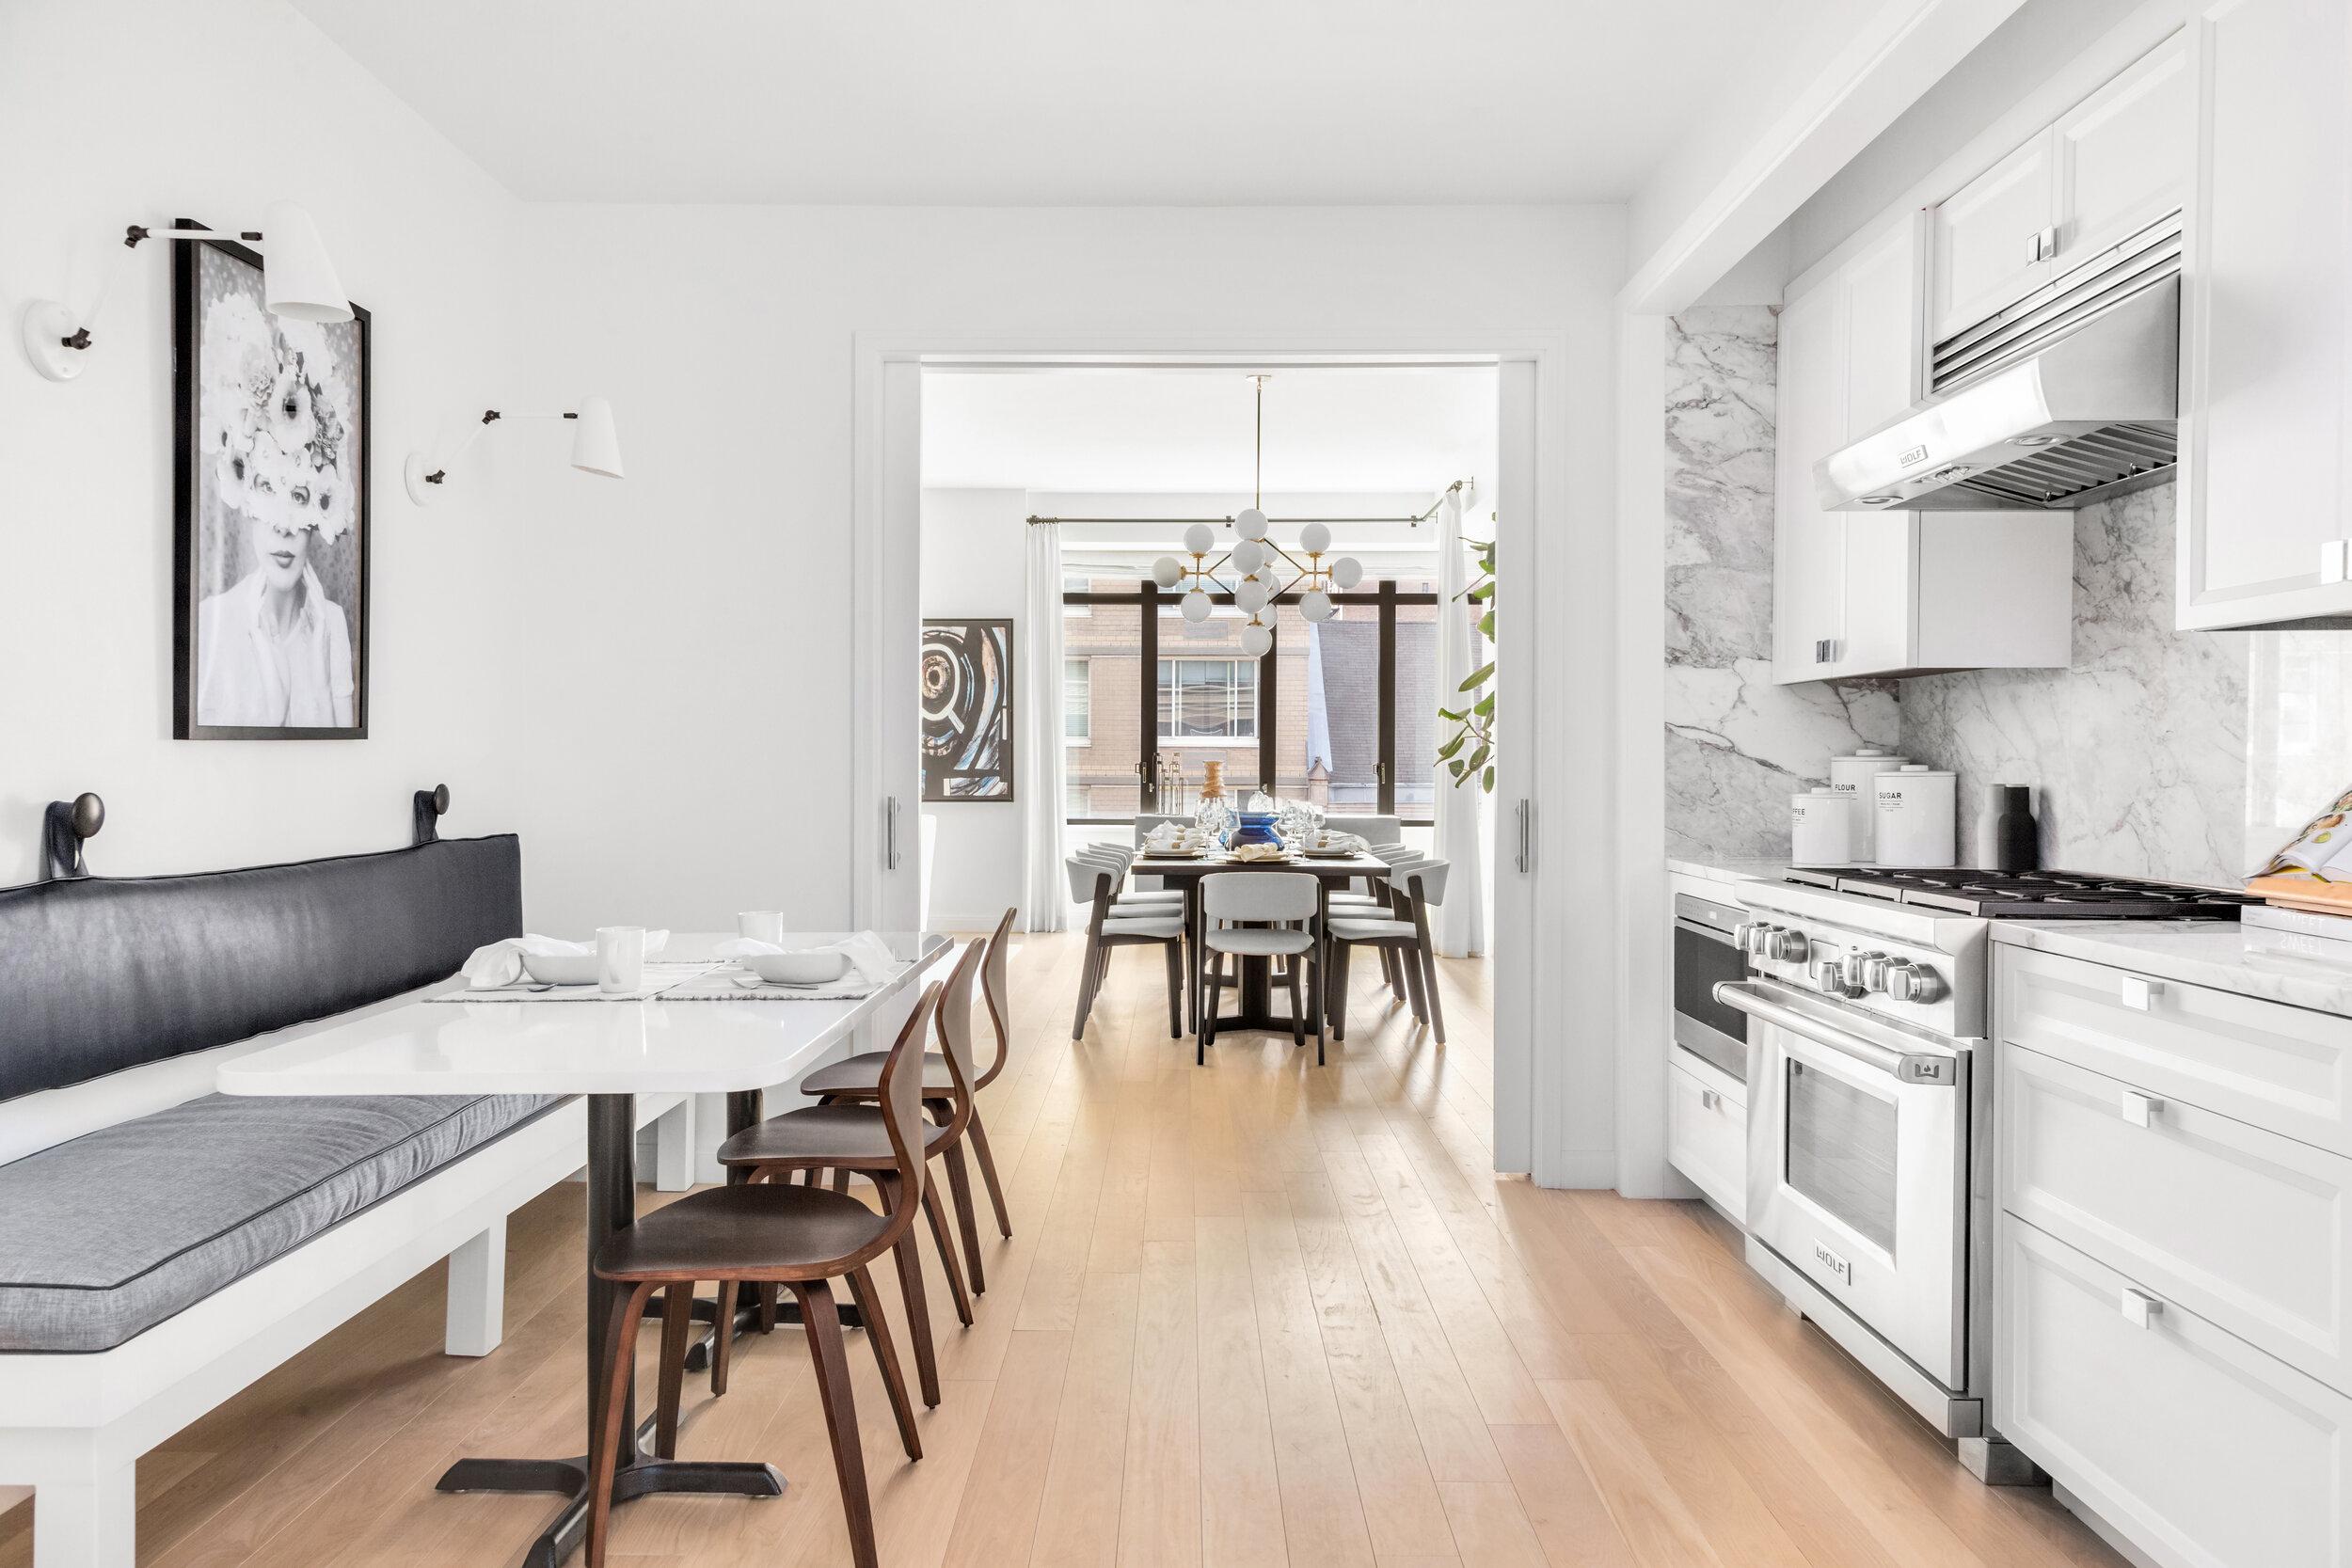 6A Kitchen 2 - High Res.jpg